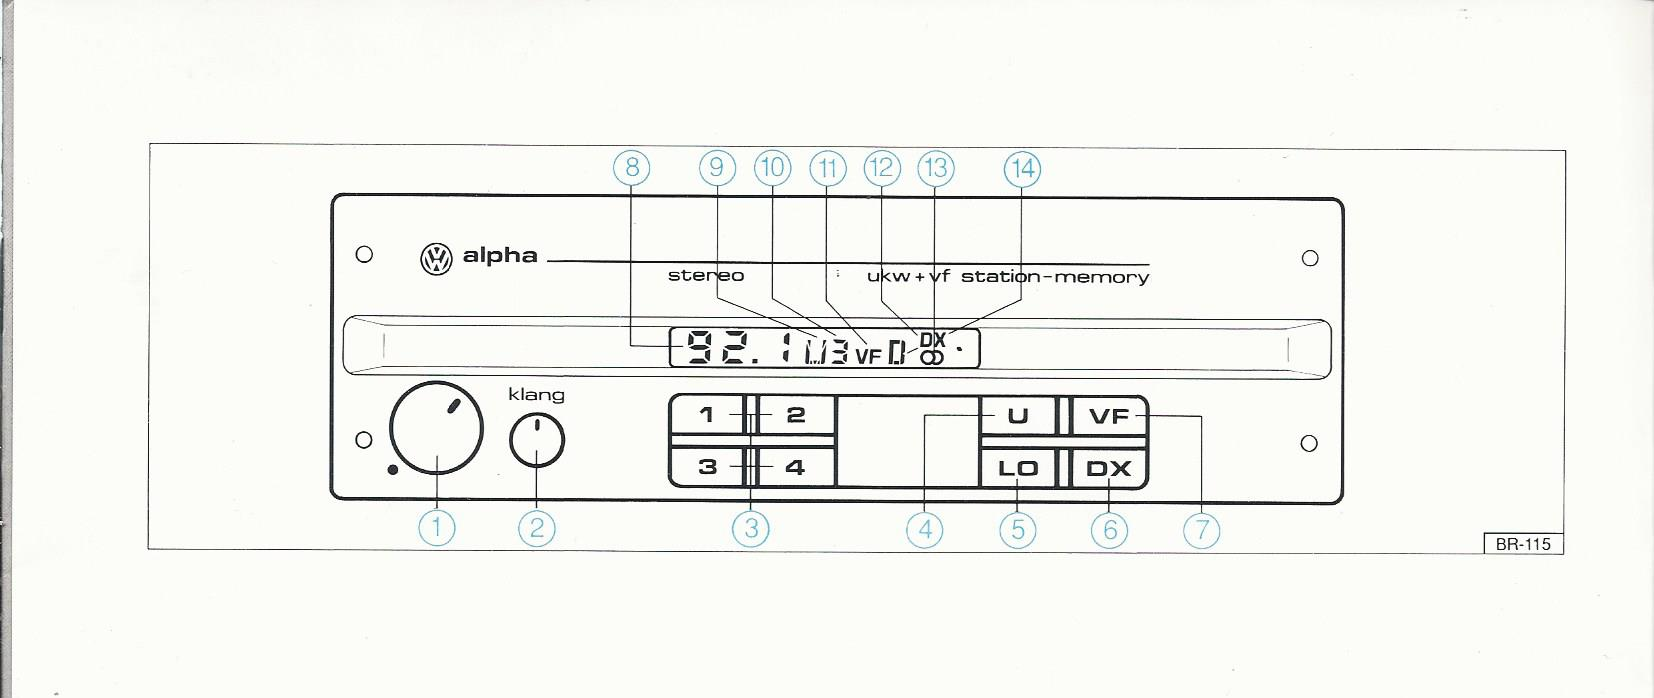 vw radio alpha betriebsanleitung 1991 bedienungsanleitung. Black Bedroom Furniture Sets. Home Design Ideas